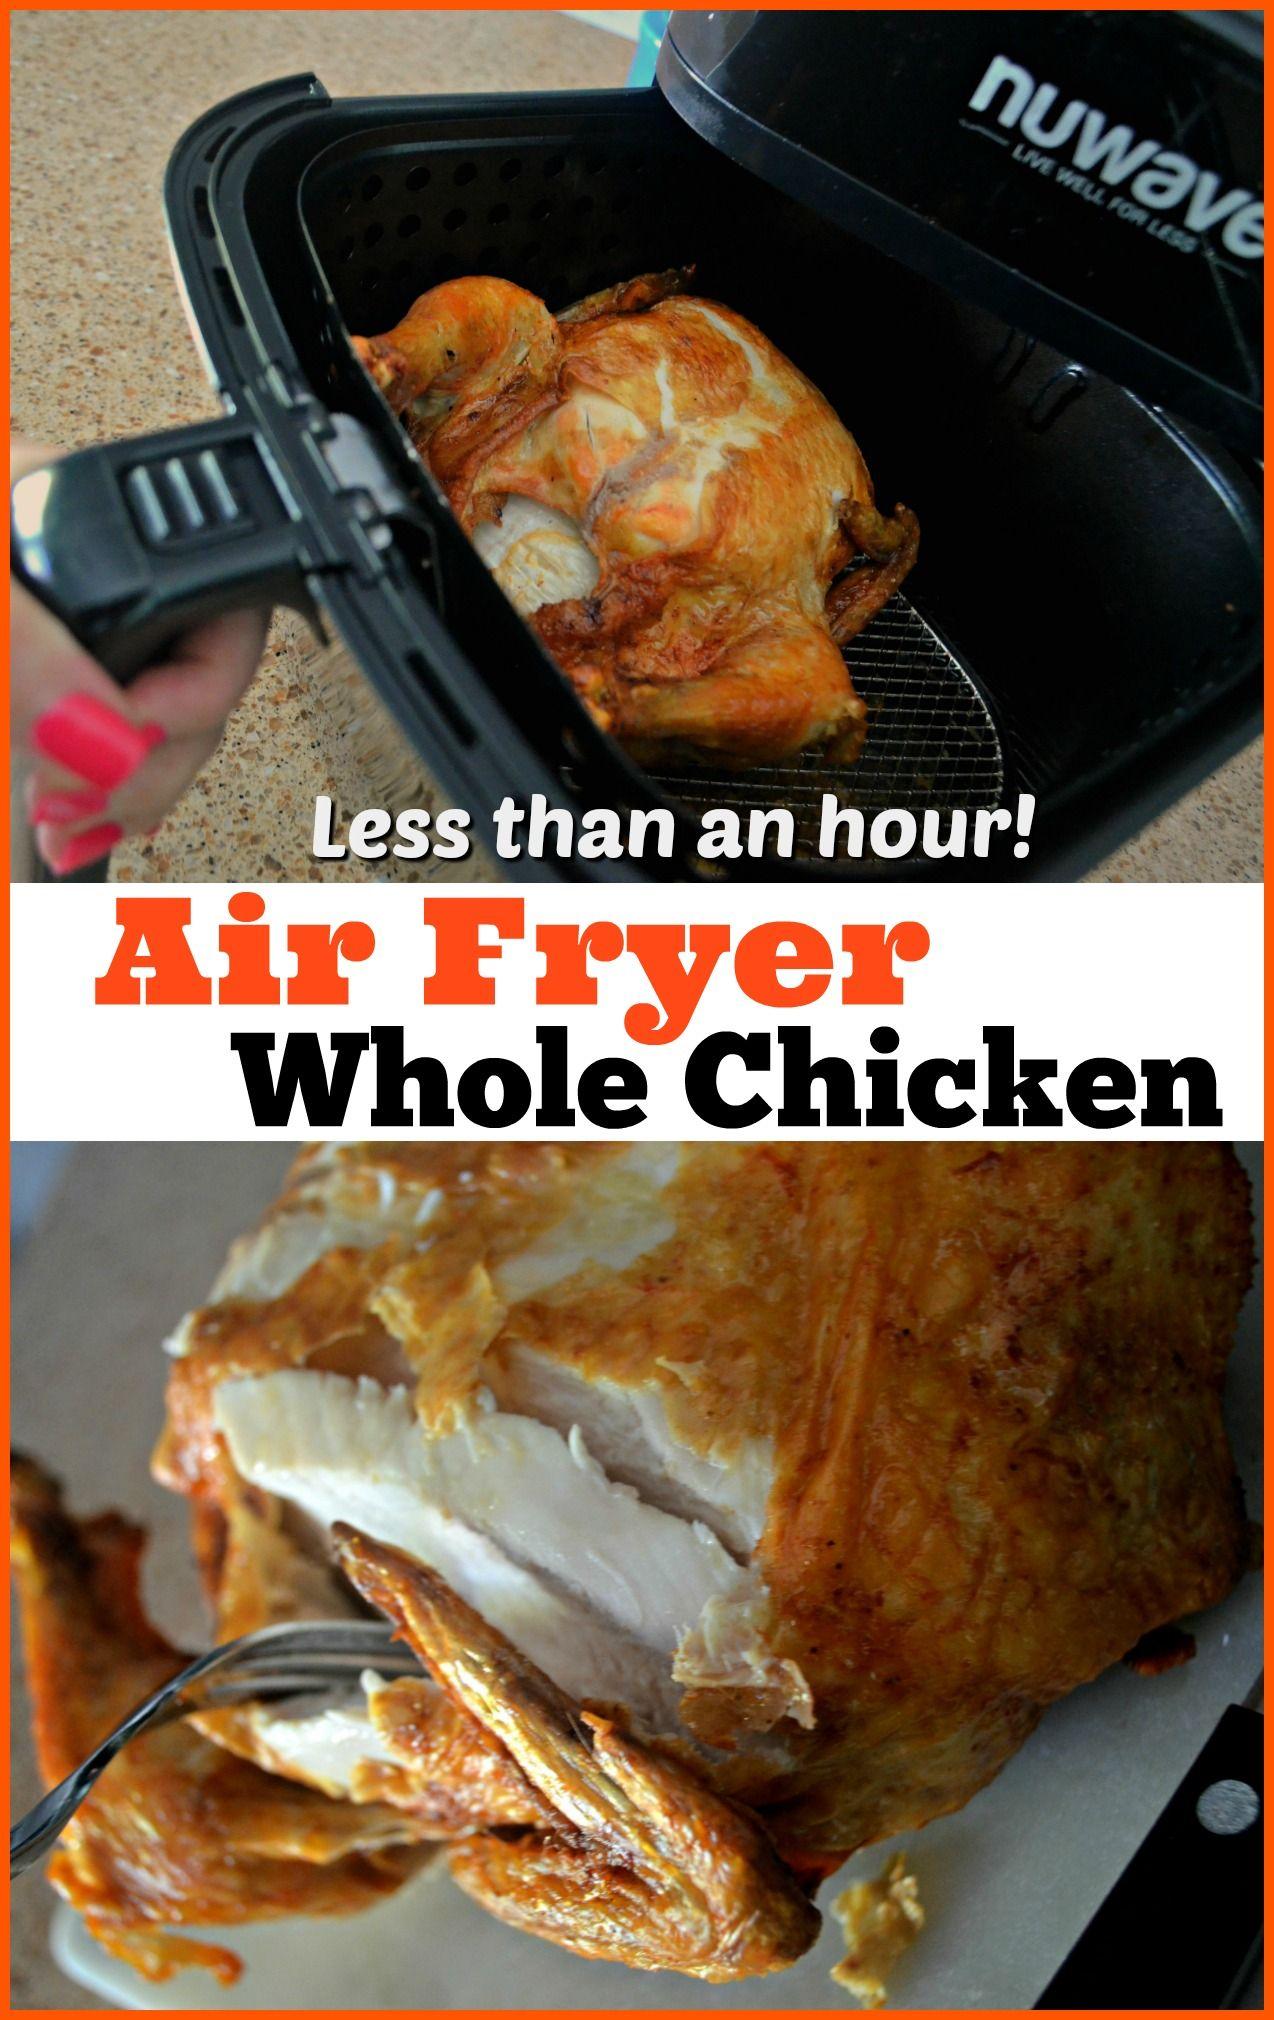 Get crispy skin with tender, falloffthebone chicken in